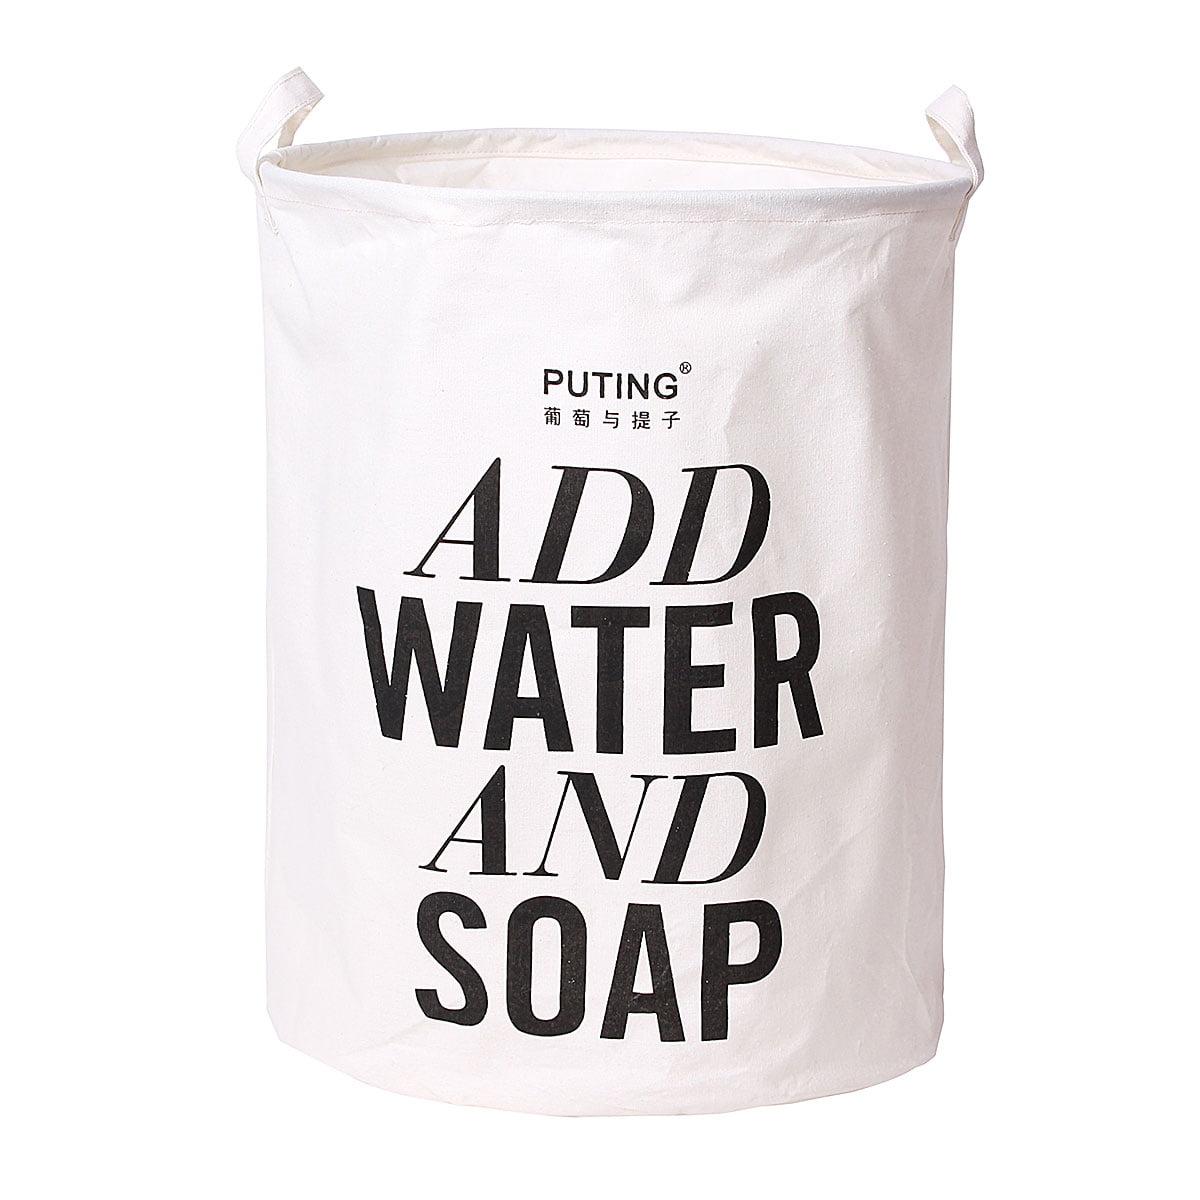 Grtsunsea Foldable Laundry Bag Basket Cotton Linen Hamper Dirty Washing Clothes & Toy Storage Organizer, ADD WATTER